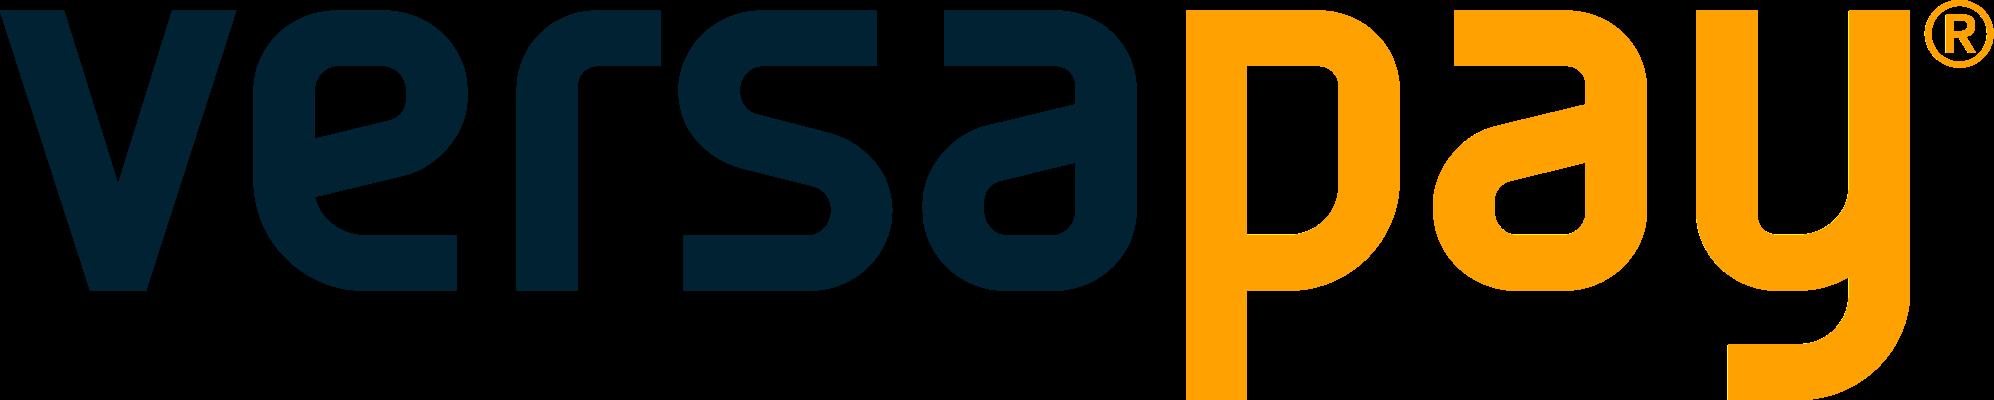 Versapay logo, SuiteCentric Partners